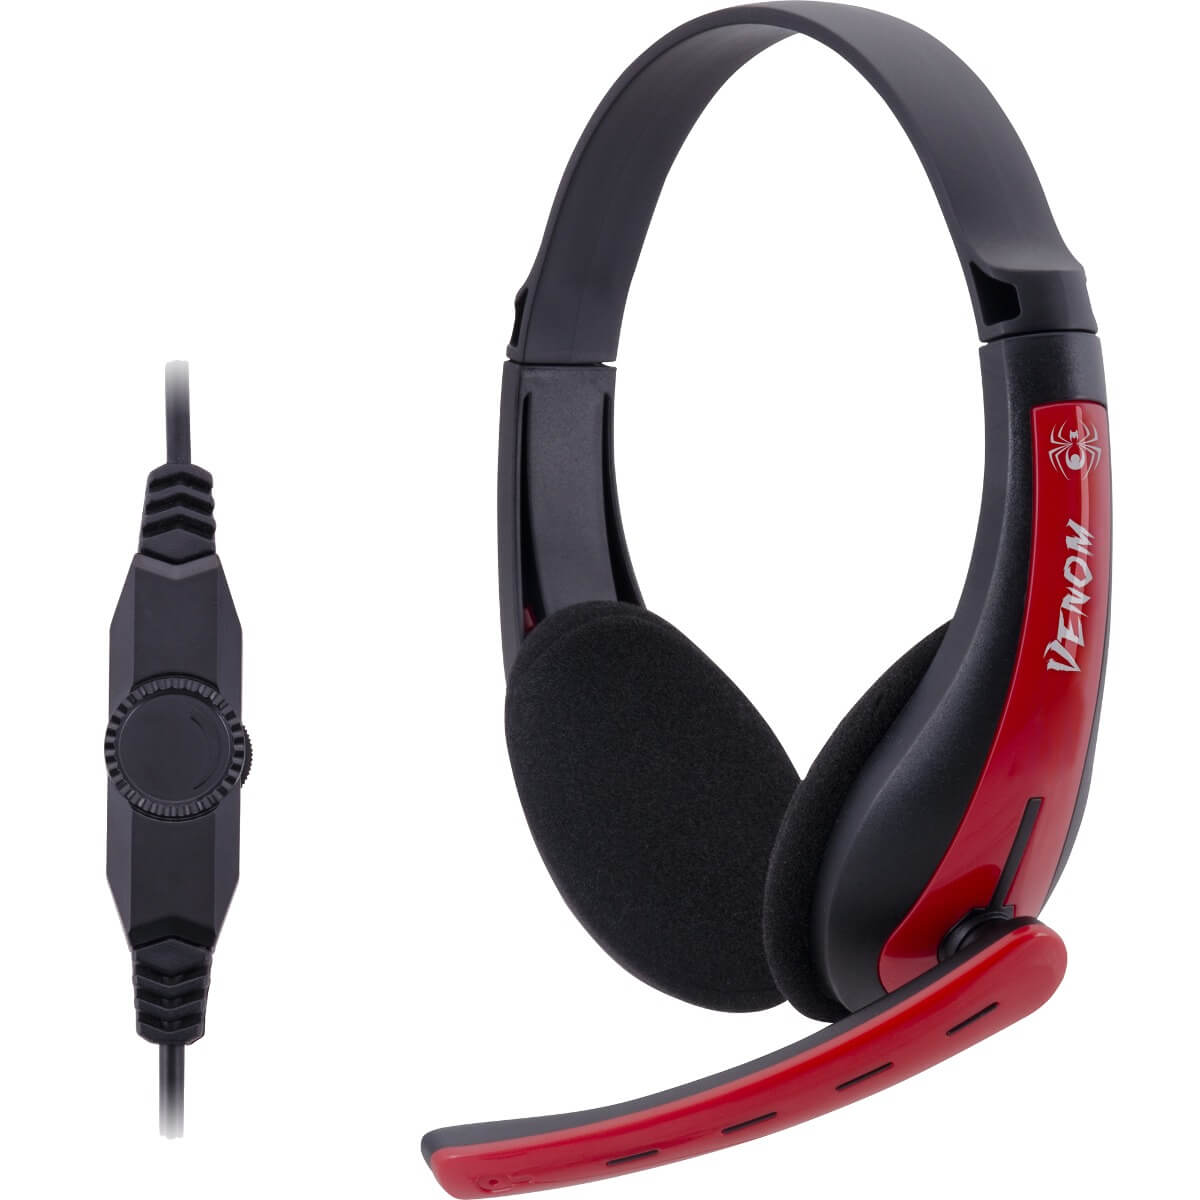 Fone de Ouvido C/ Microfone Headset Gamer Fortrek Venom, PC / XBOX - SHS-701